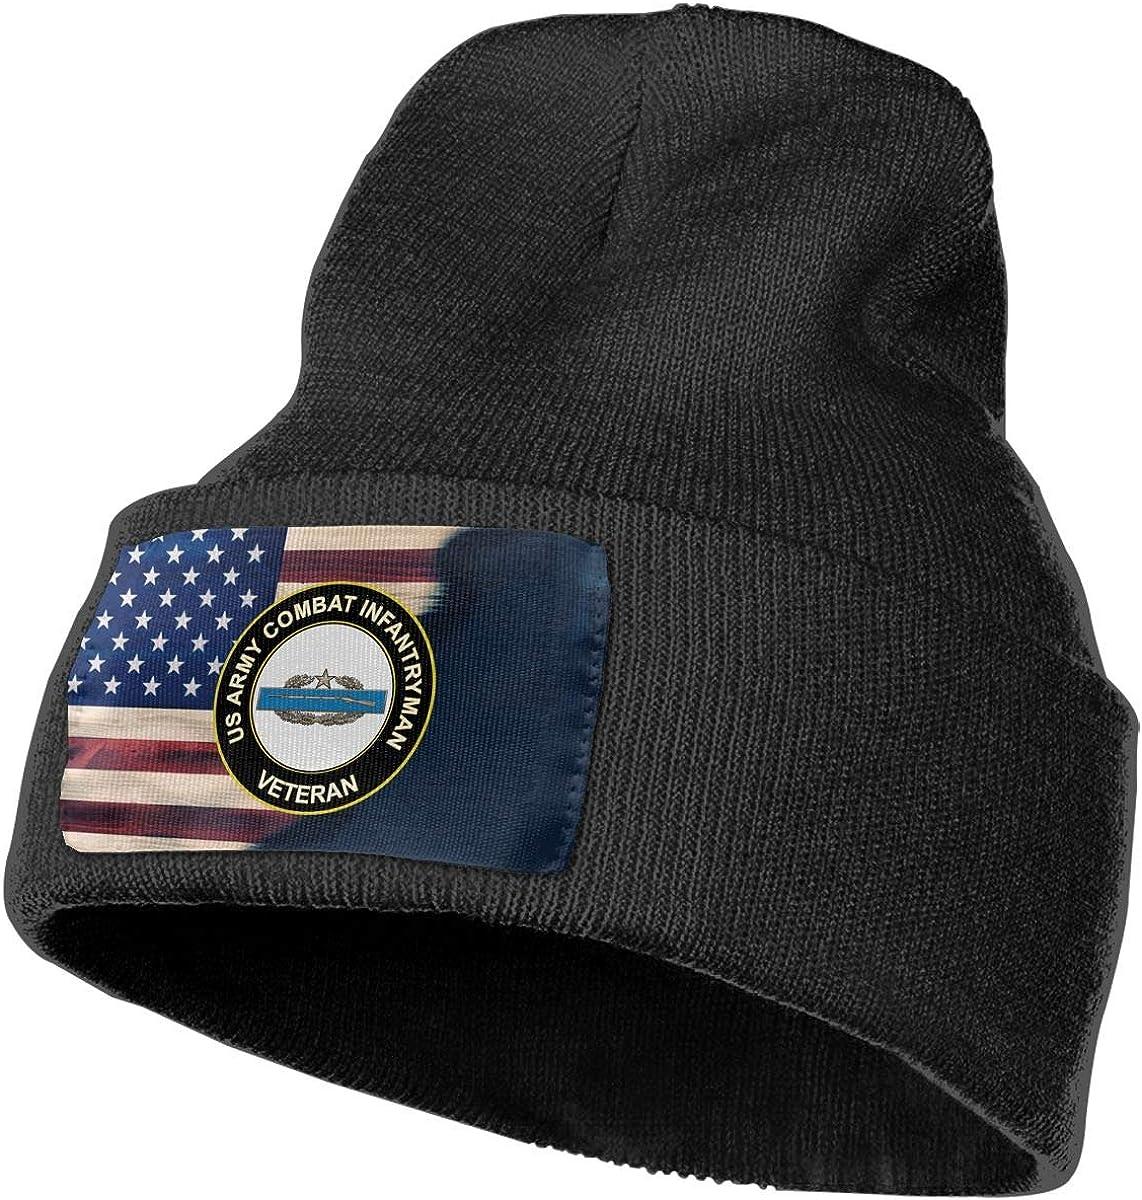 FORDSAN CP US Army Combat Infantry 2nd Award Veteran Mens Beanie Cap Skull Cap Winter Warm Knitting Hats.